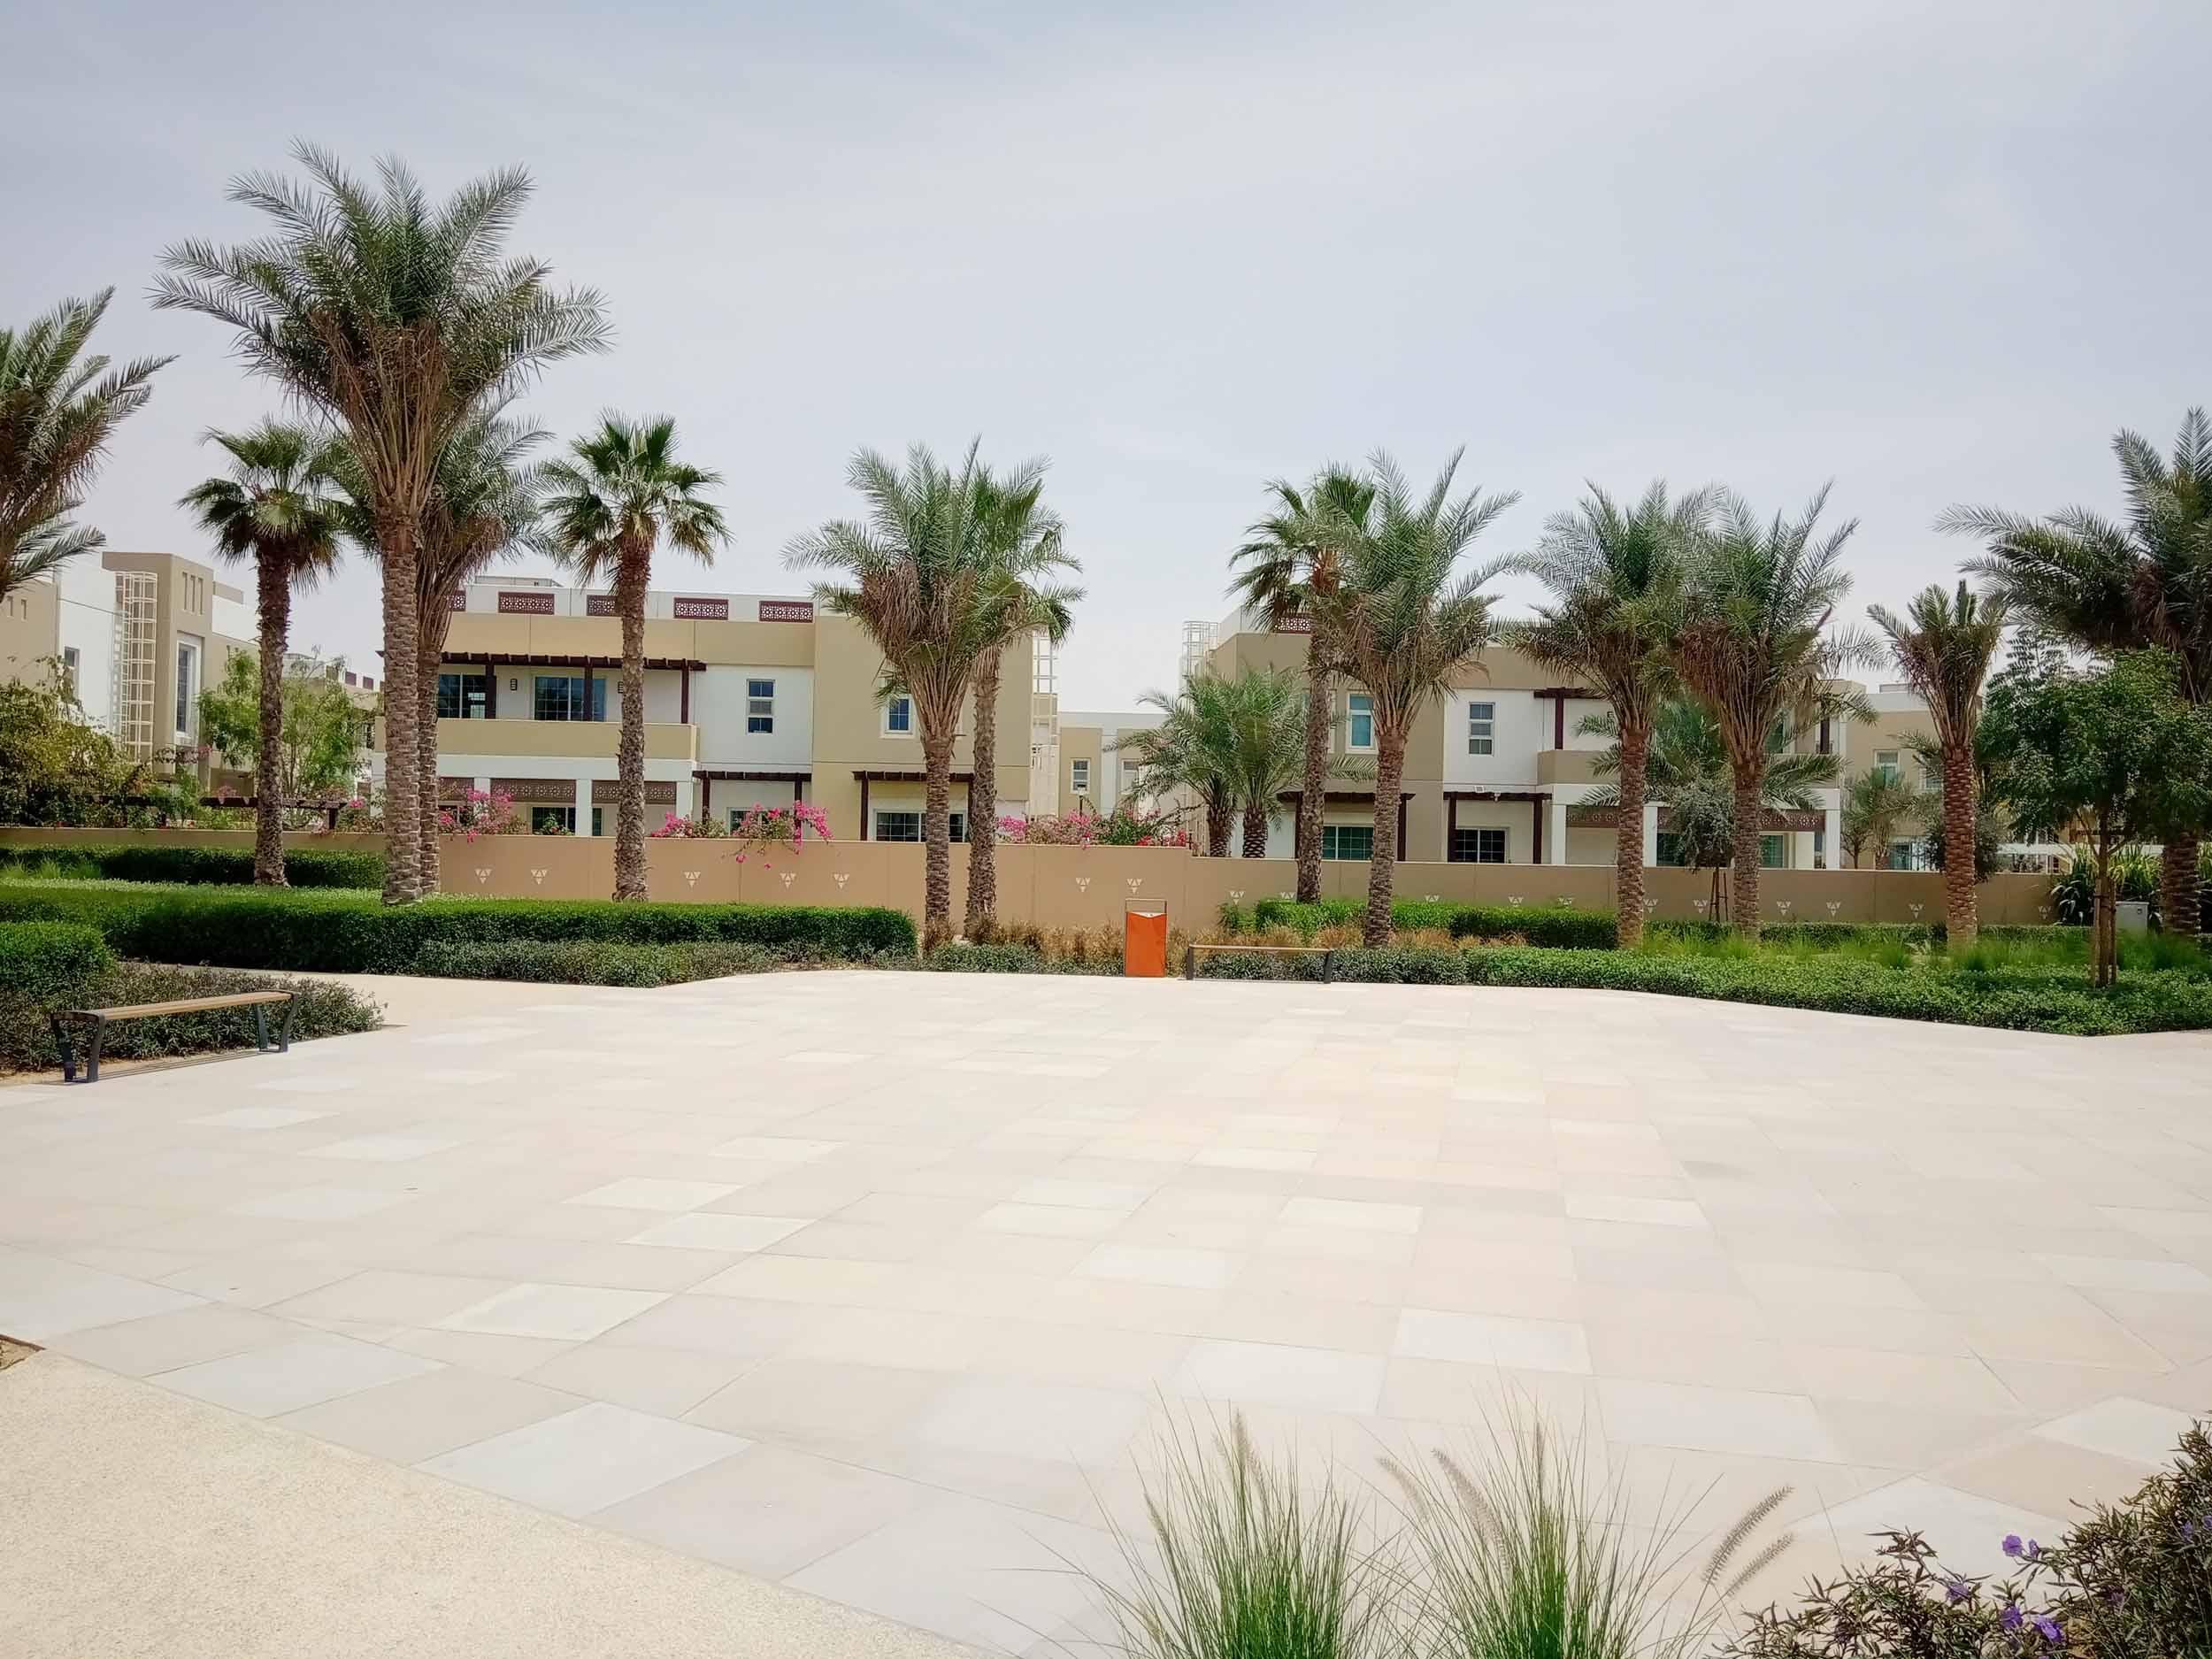 Instarmac_UltraScape_Flowpoint_Dubailand.jpg